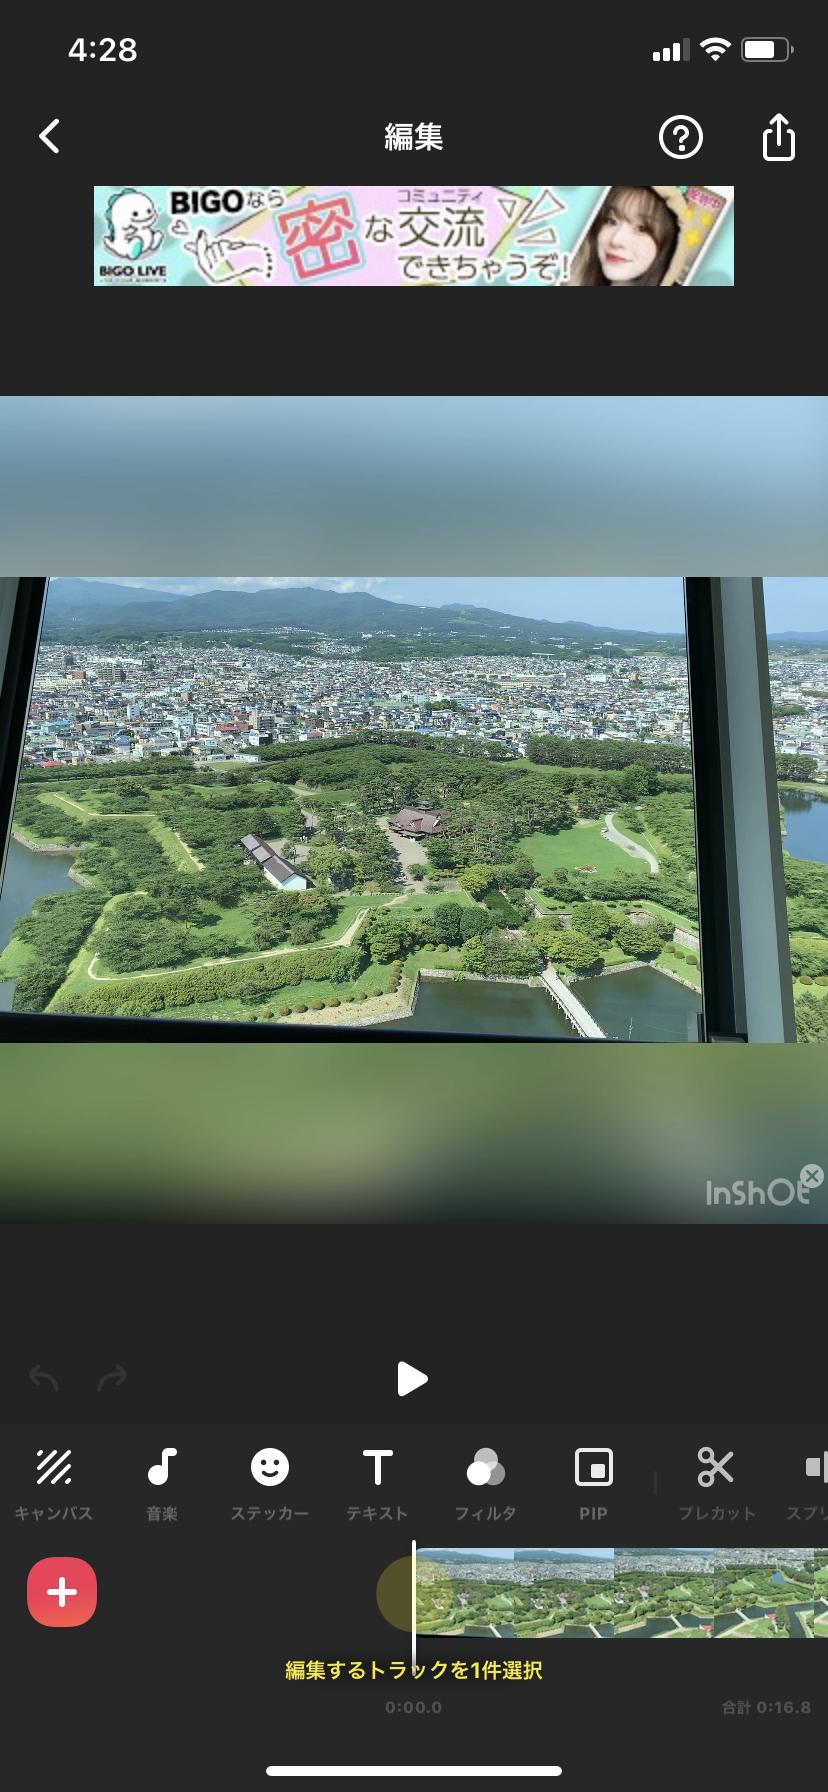 InstaShot(インスタショット) InShotを使ったヨコさんのクチコミ画像1